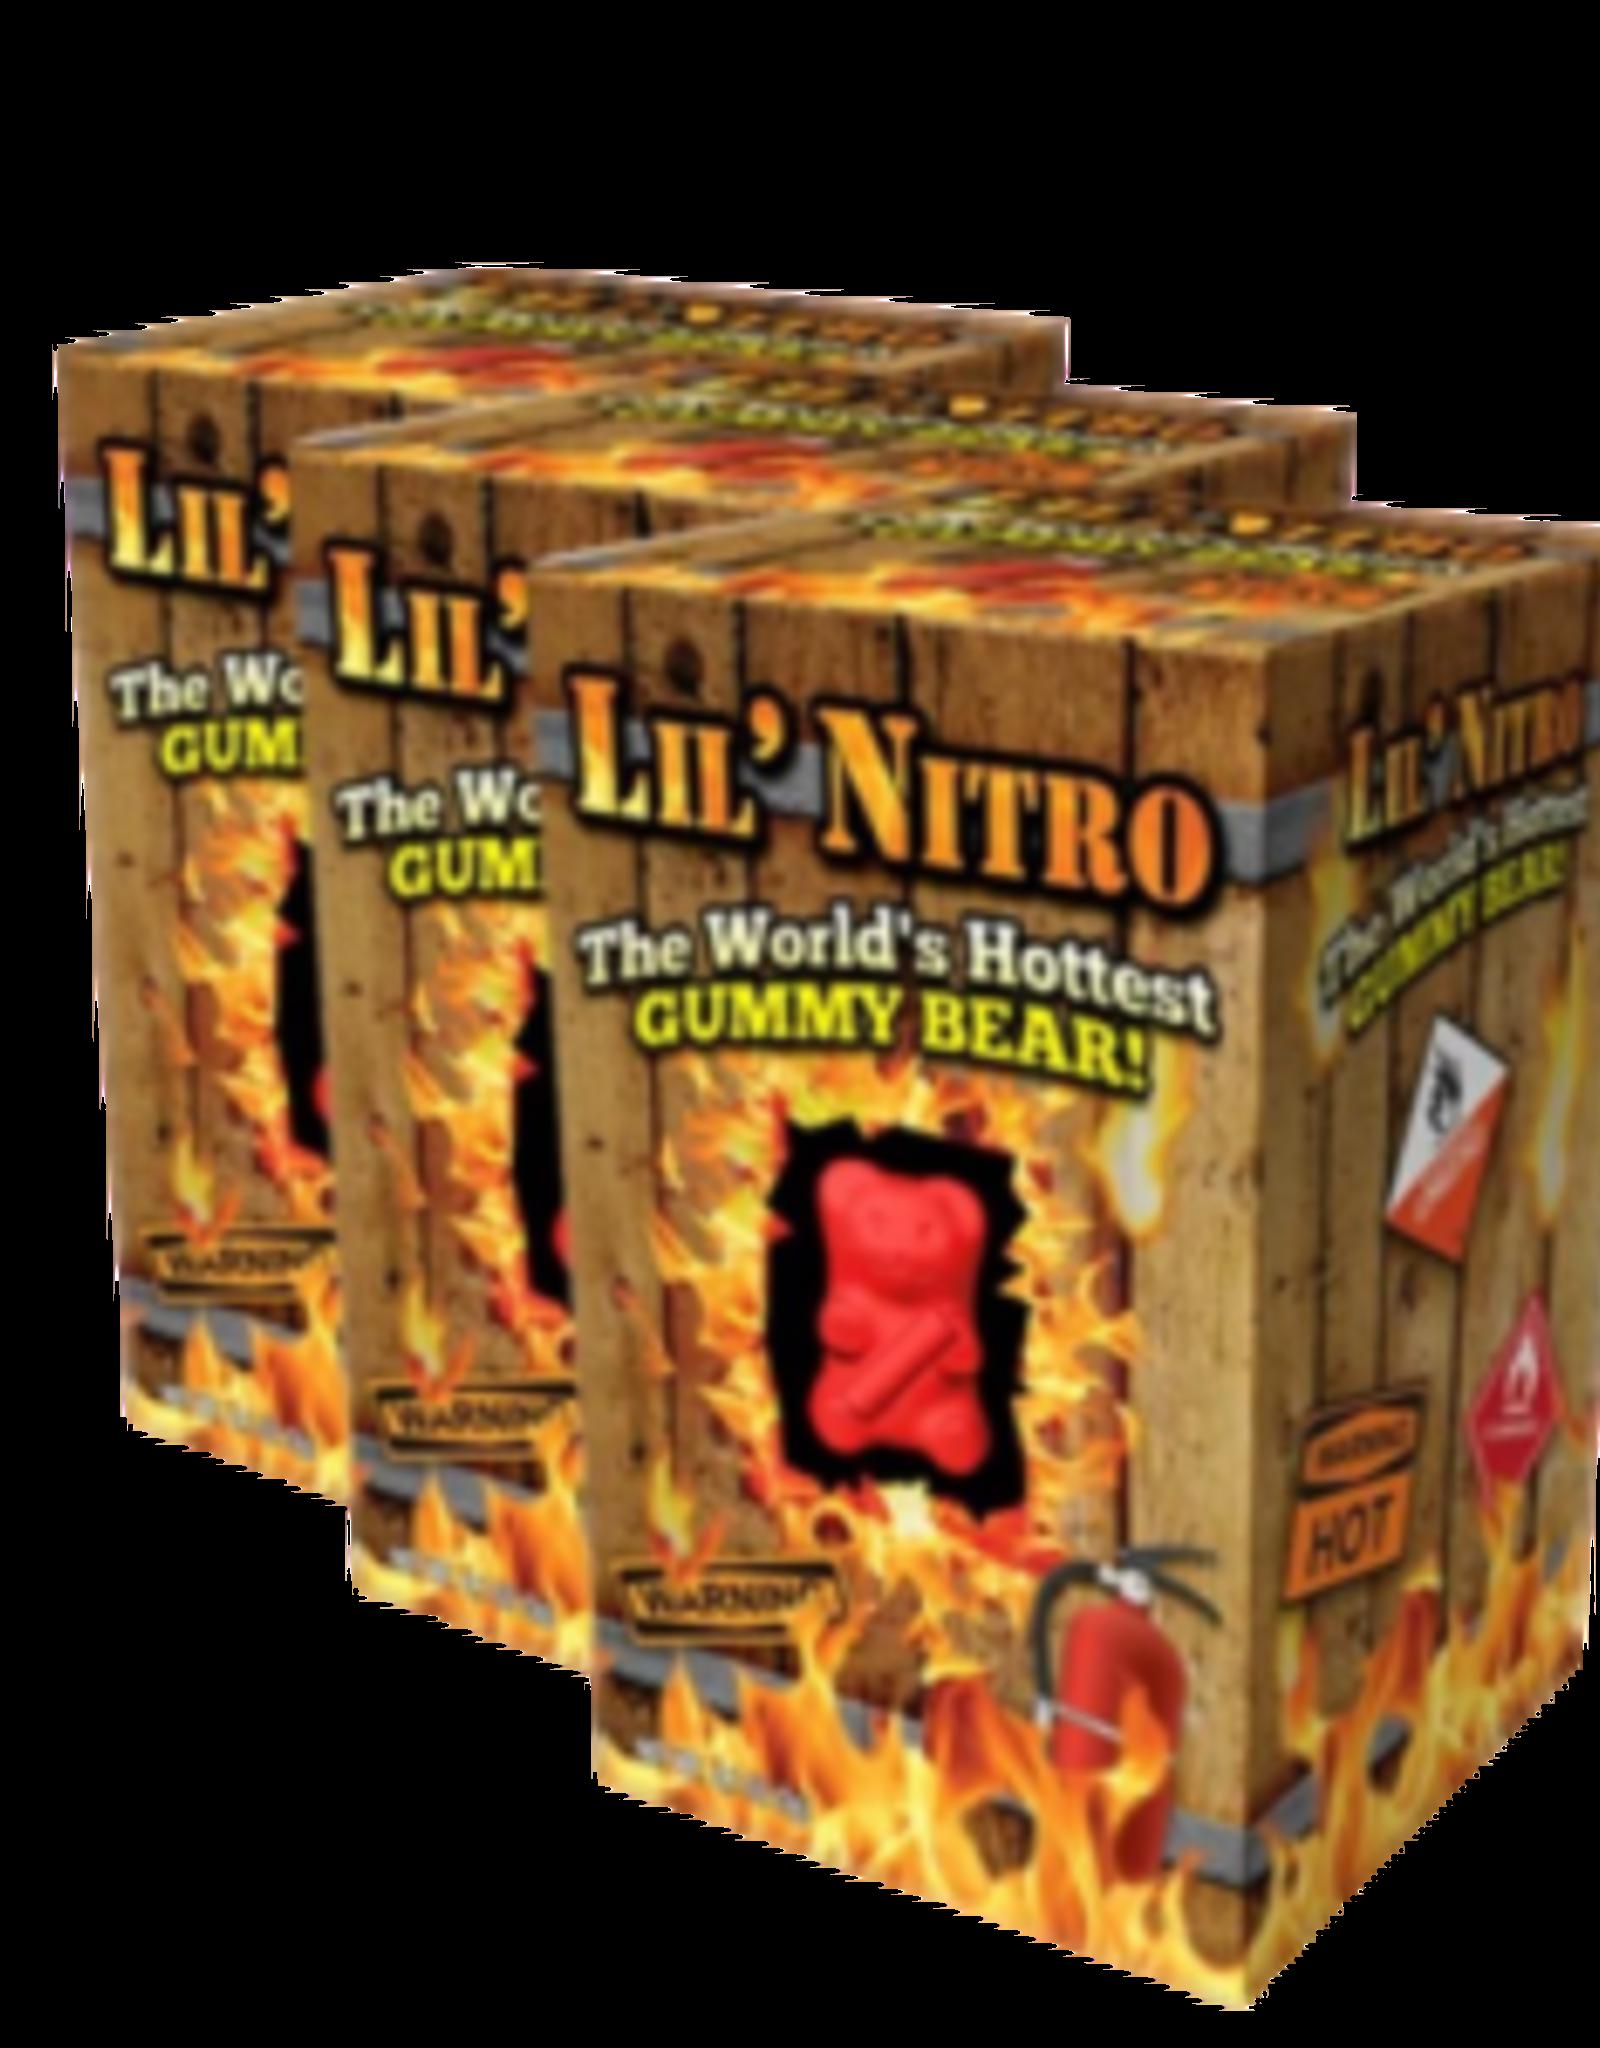 Lil' Nitro